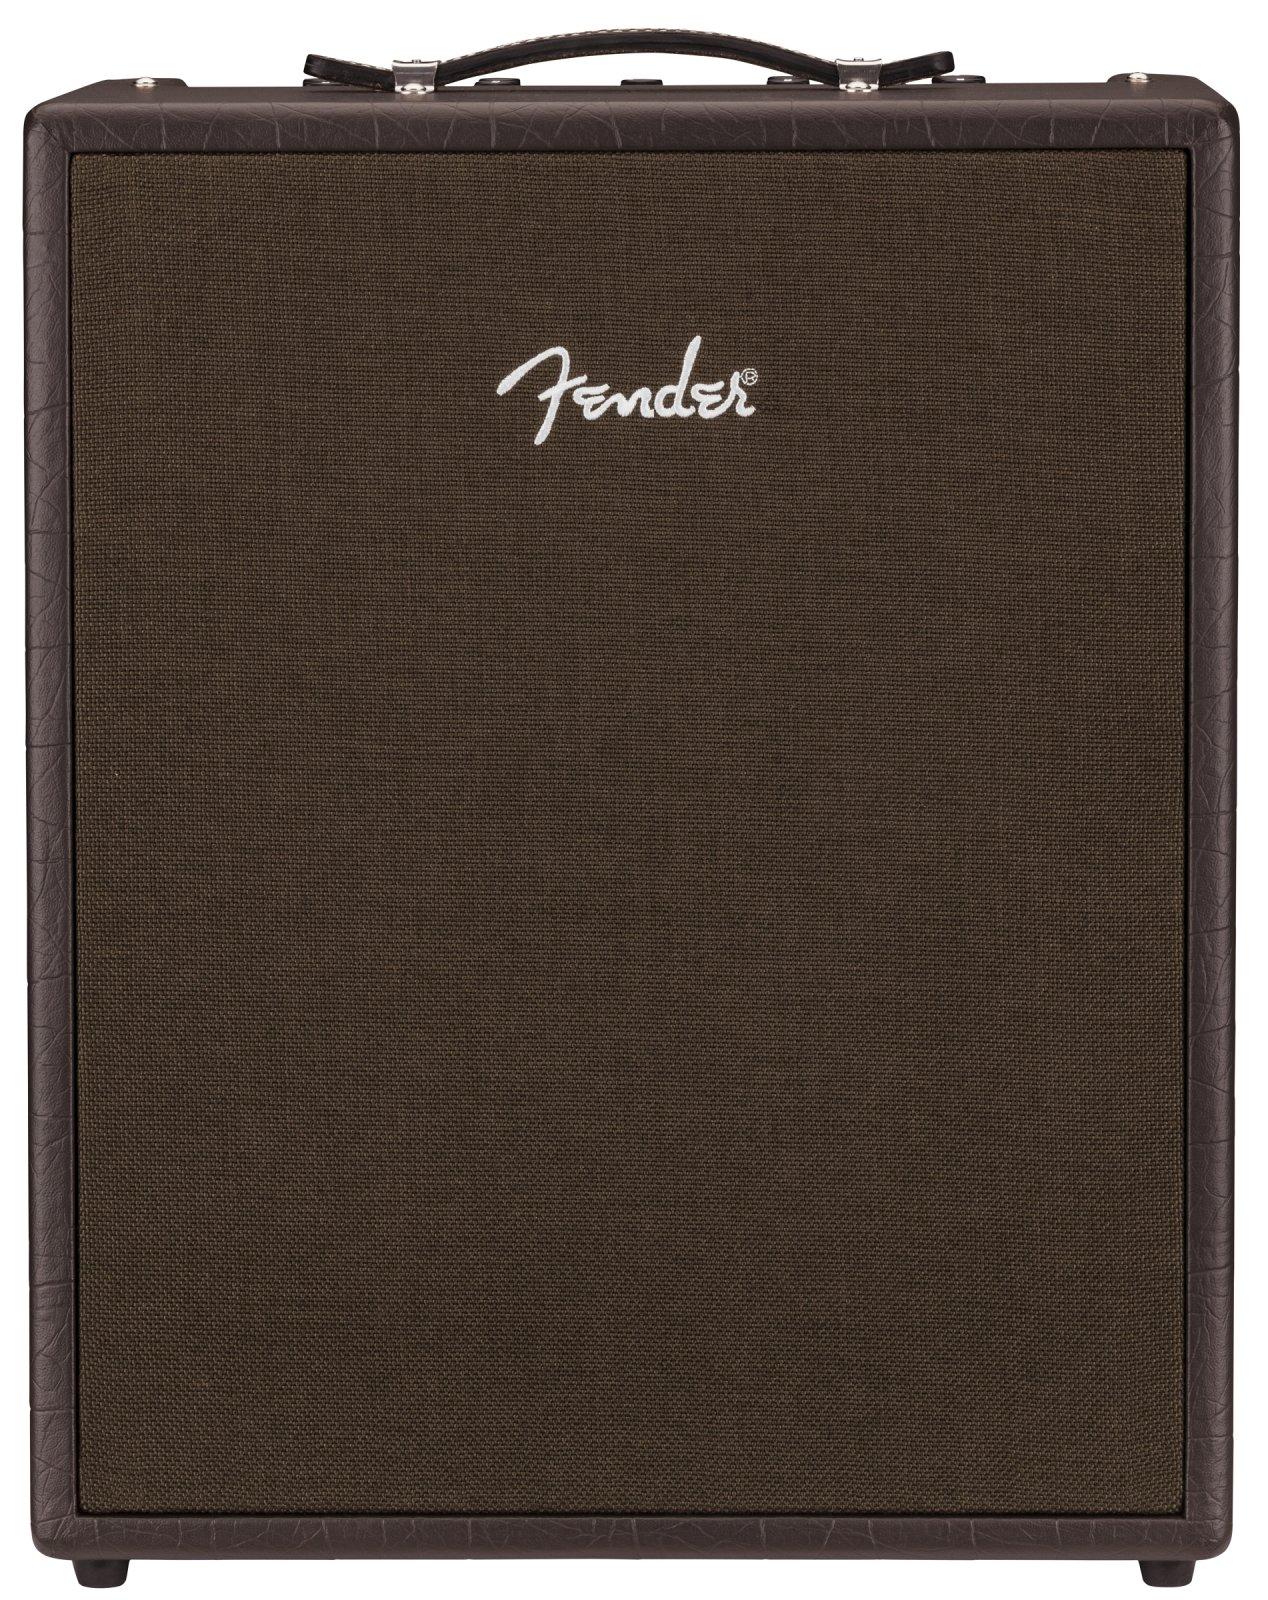 Fender Acoustic SFX II Acoustic Amp